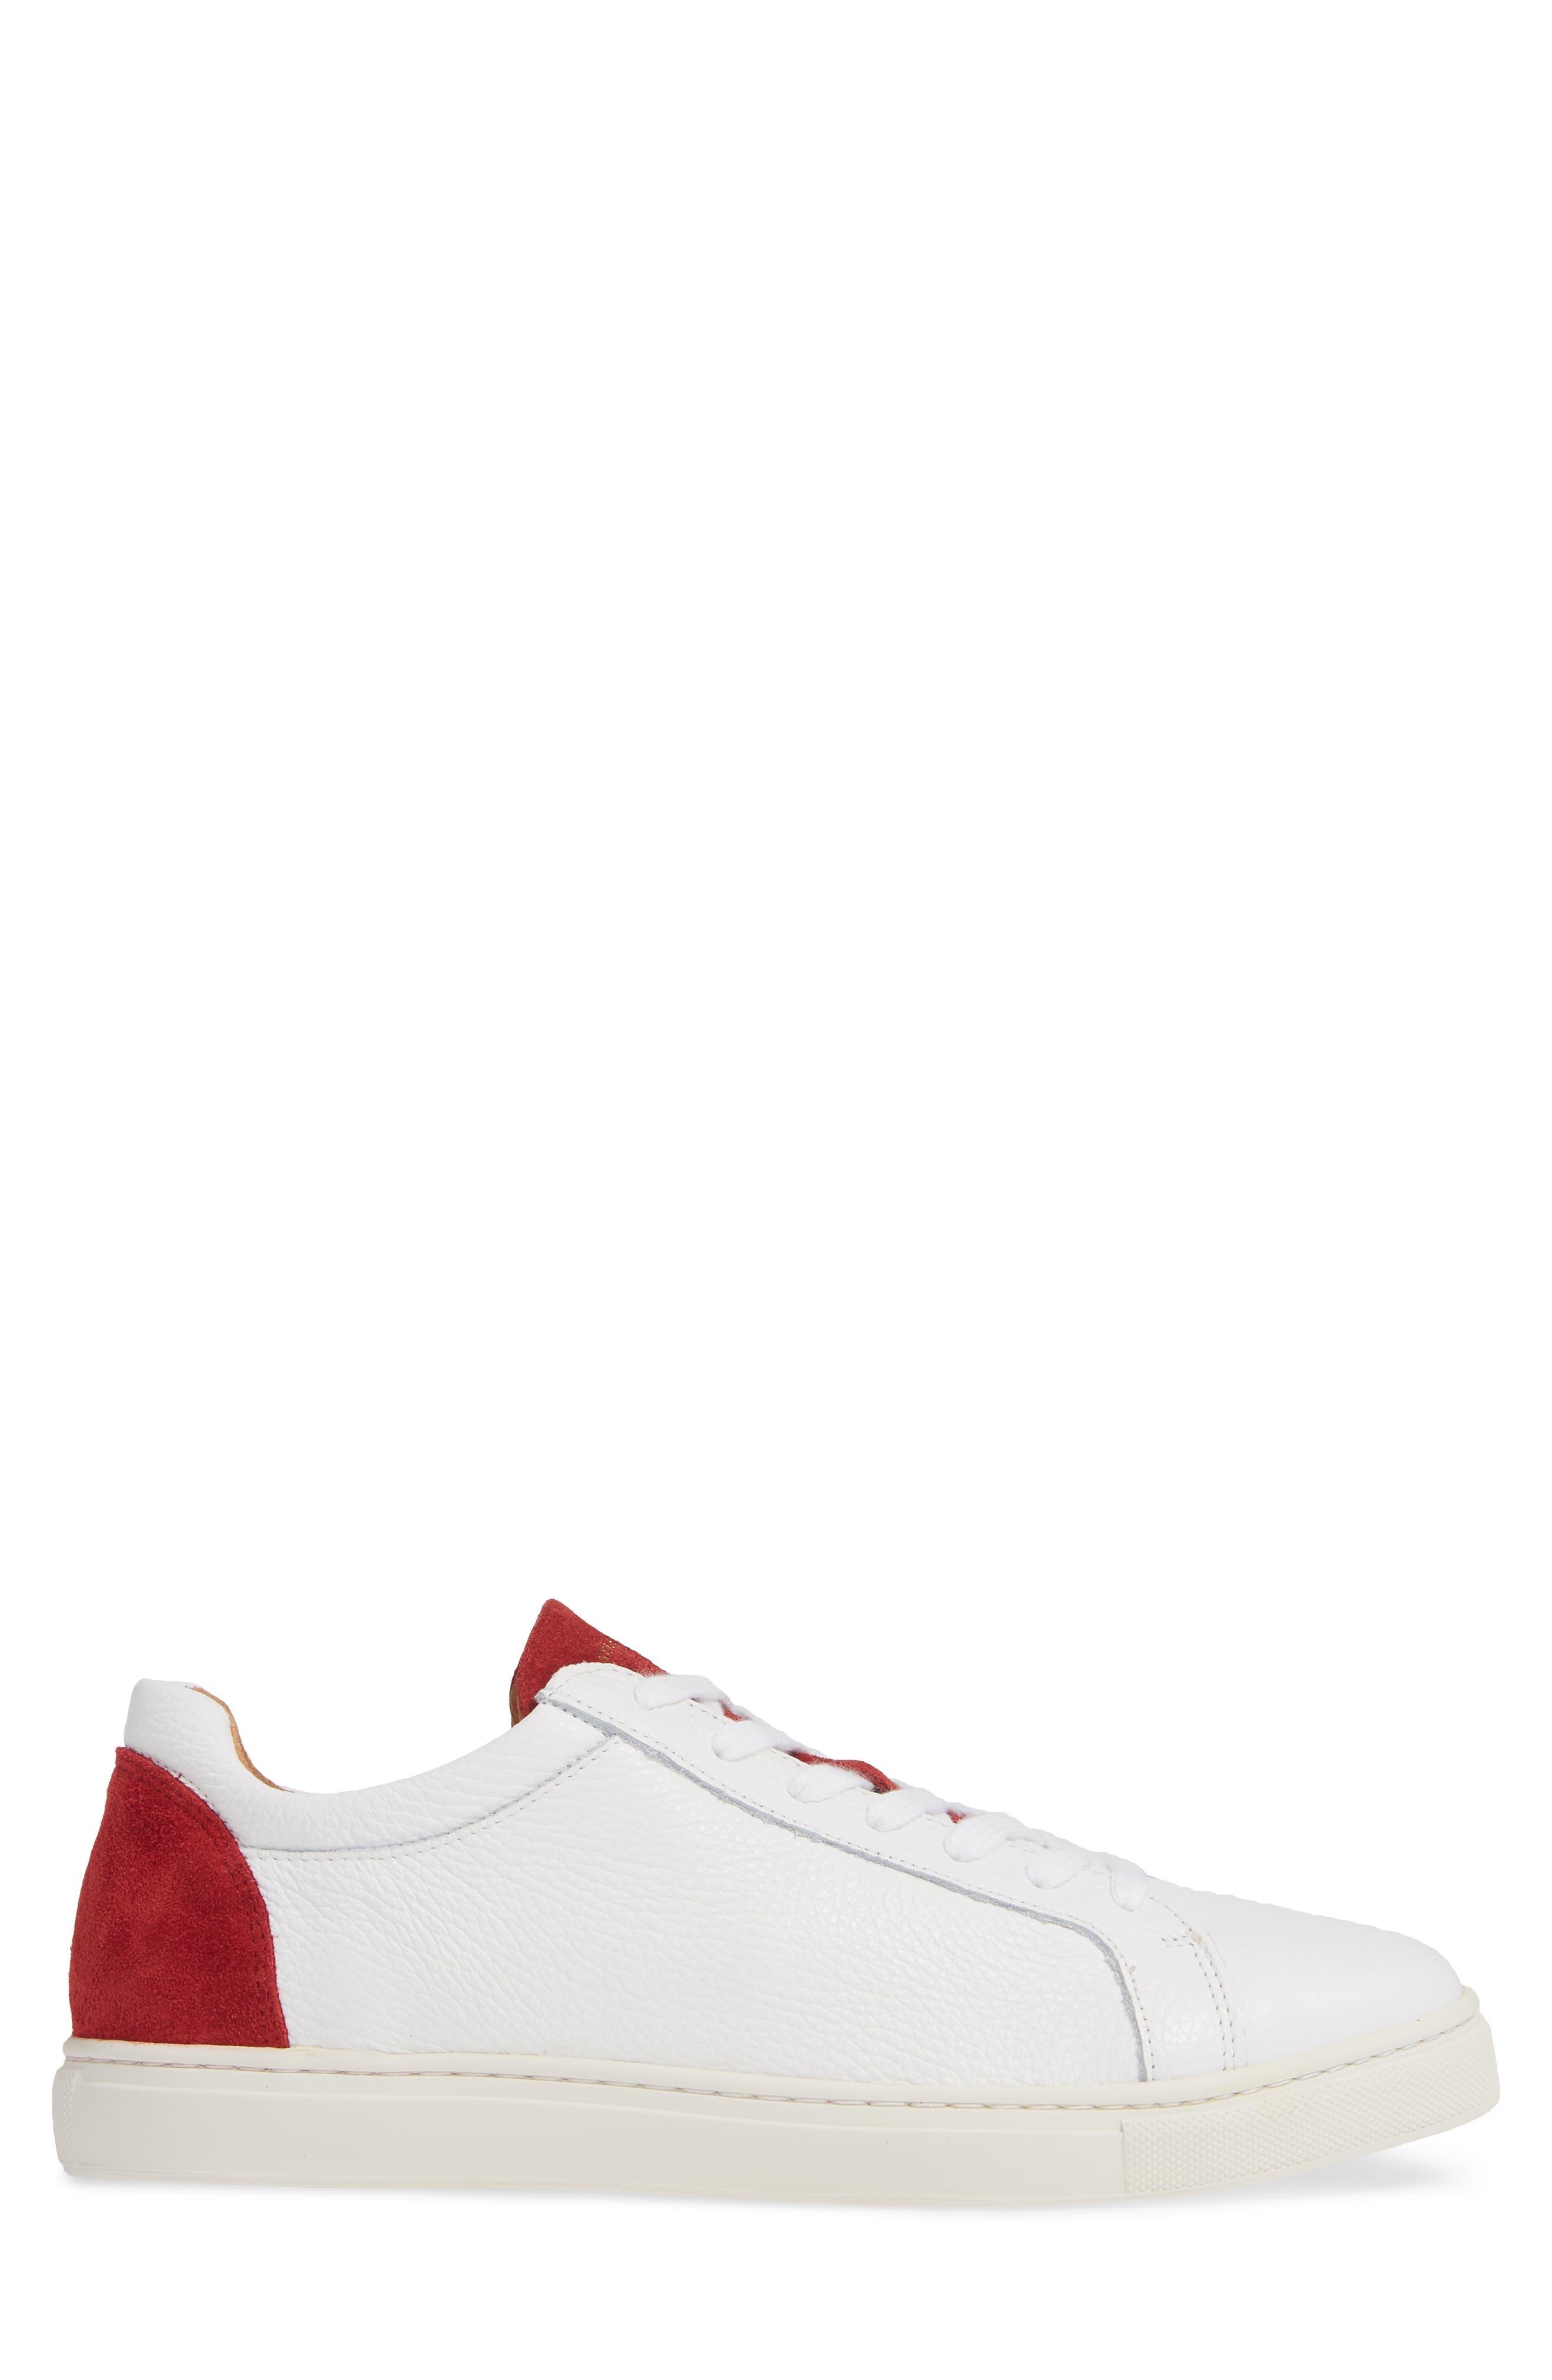 David Colorblock Sneaker,                             Alternate thumbnail 3, color,                             WHITE/ BARBADOS CHERRY